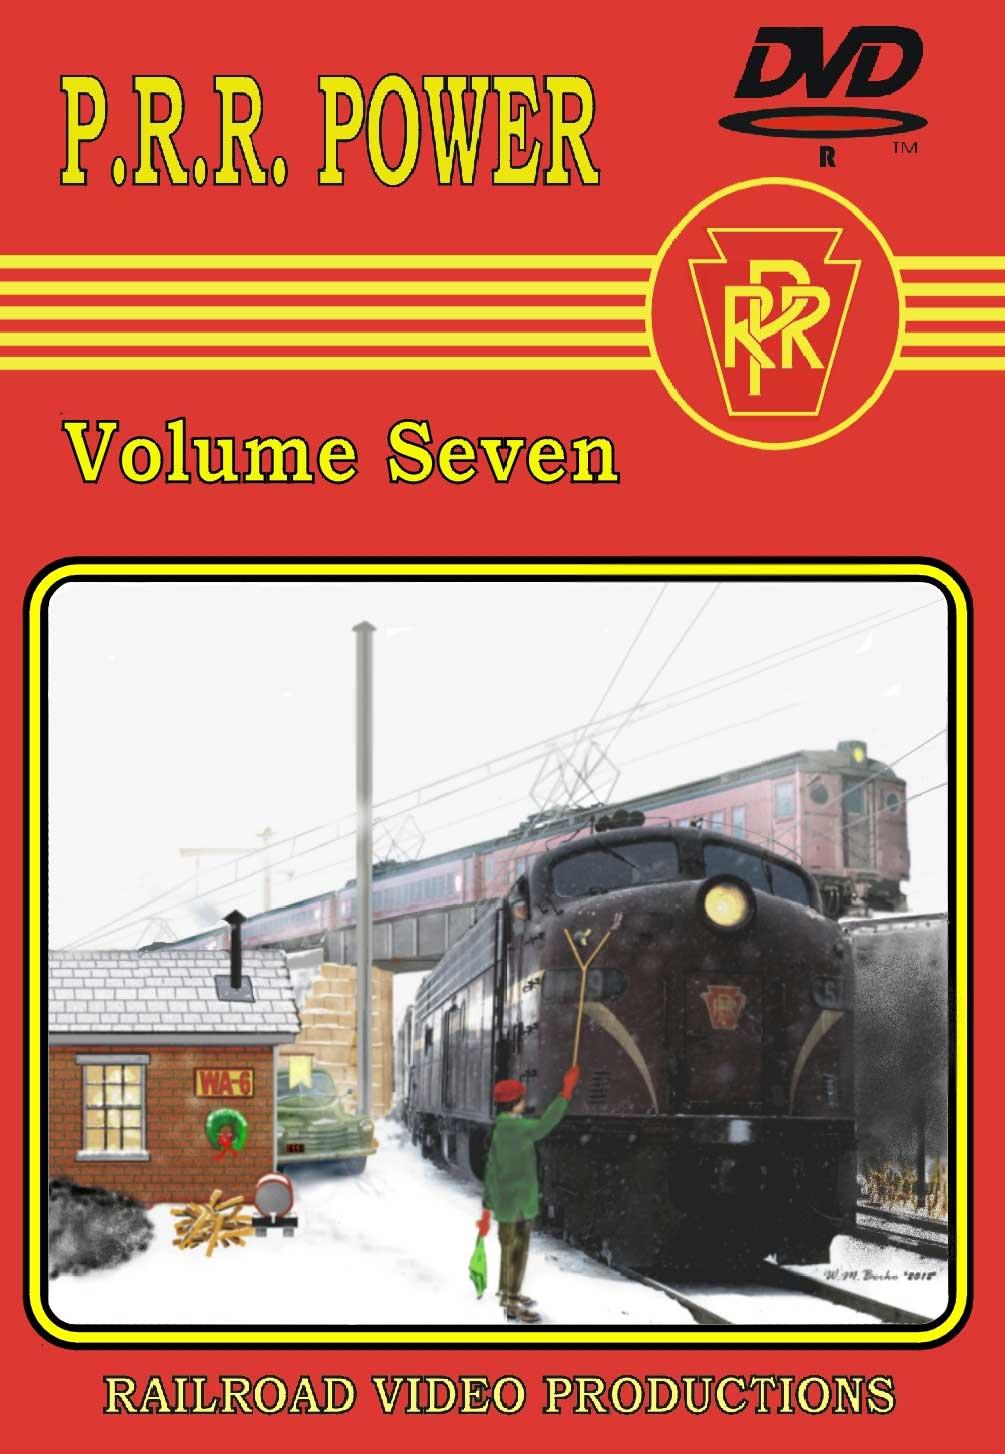 Pennsylvania Railroad Power Volume 7 DVD Train Video Railroad Video Productions RVP208D